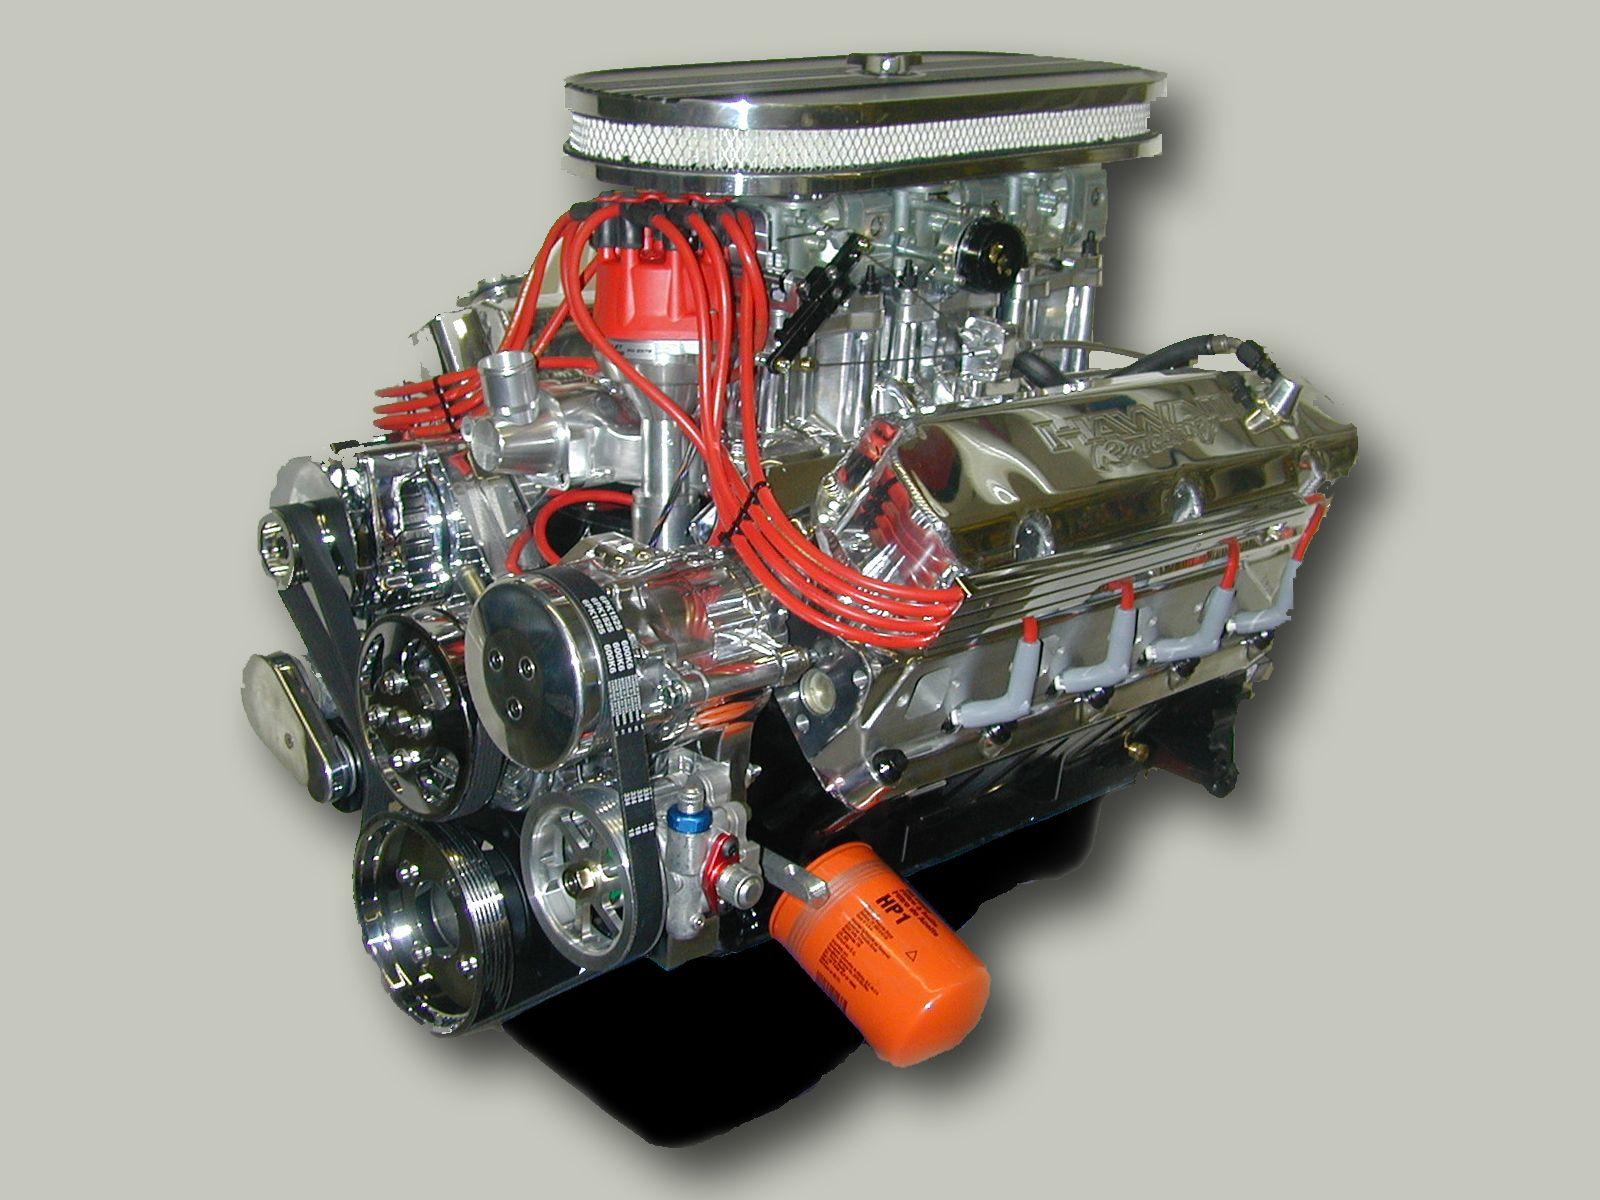 460ci Ford Engine Intake Diagram Reveolution Of Wiring 351 Windsor Racing 351w 374ci 427ci Stroker Rh Pinterest Com Classic 1990 E350